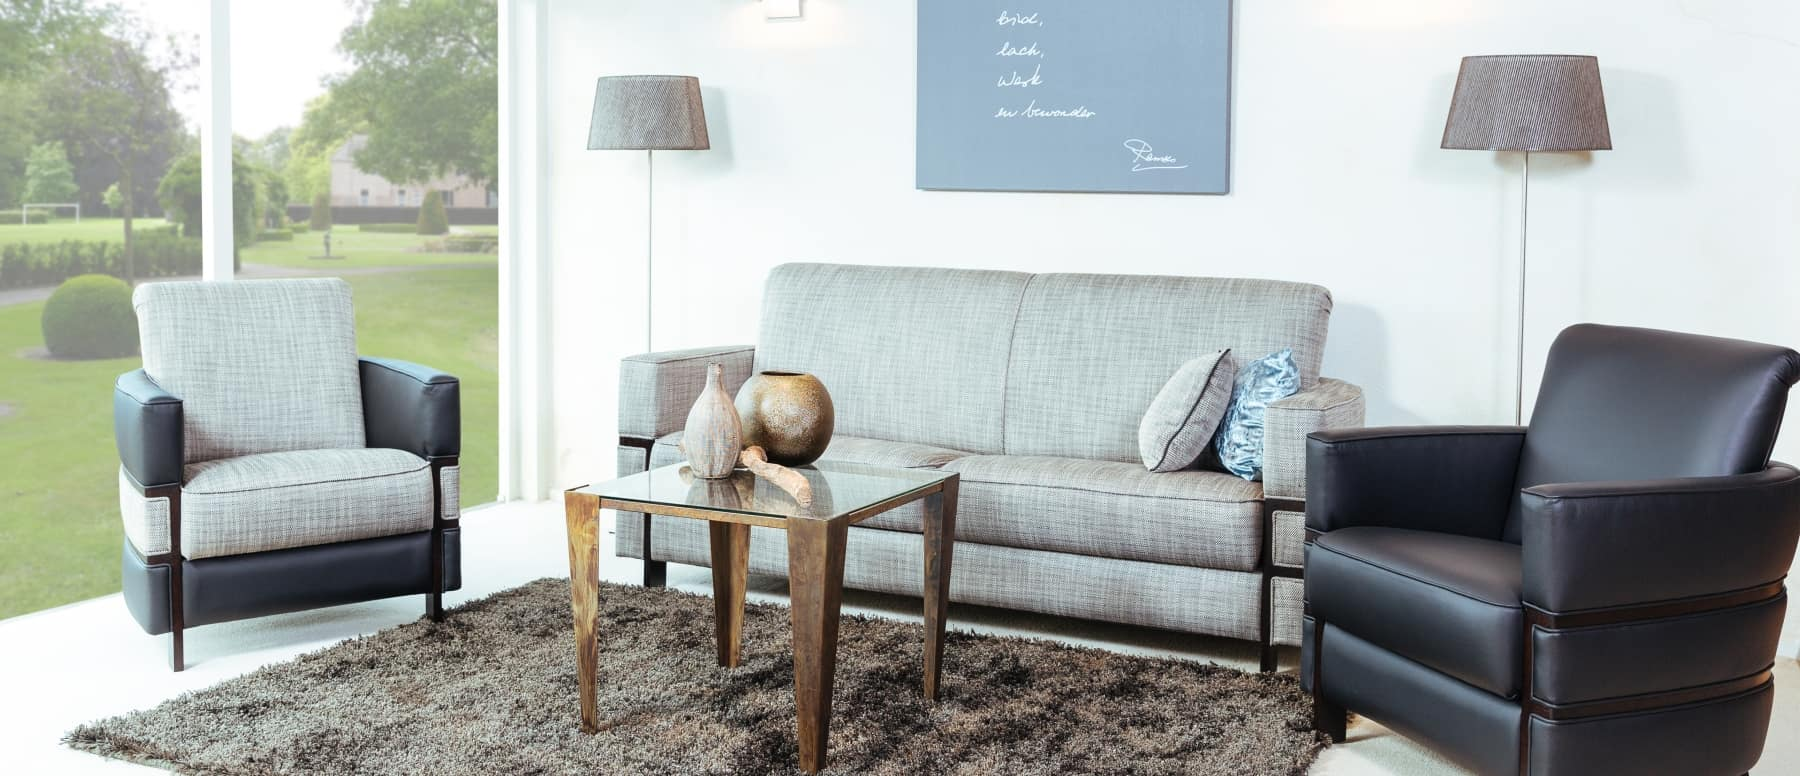 DN design meubelen 2